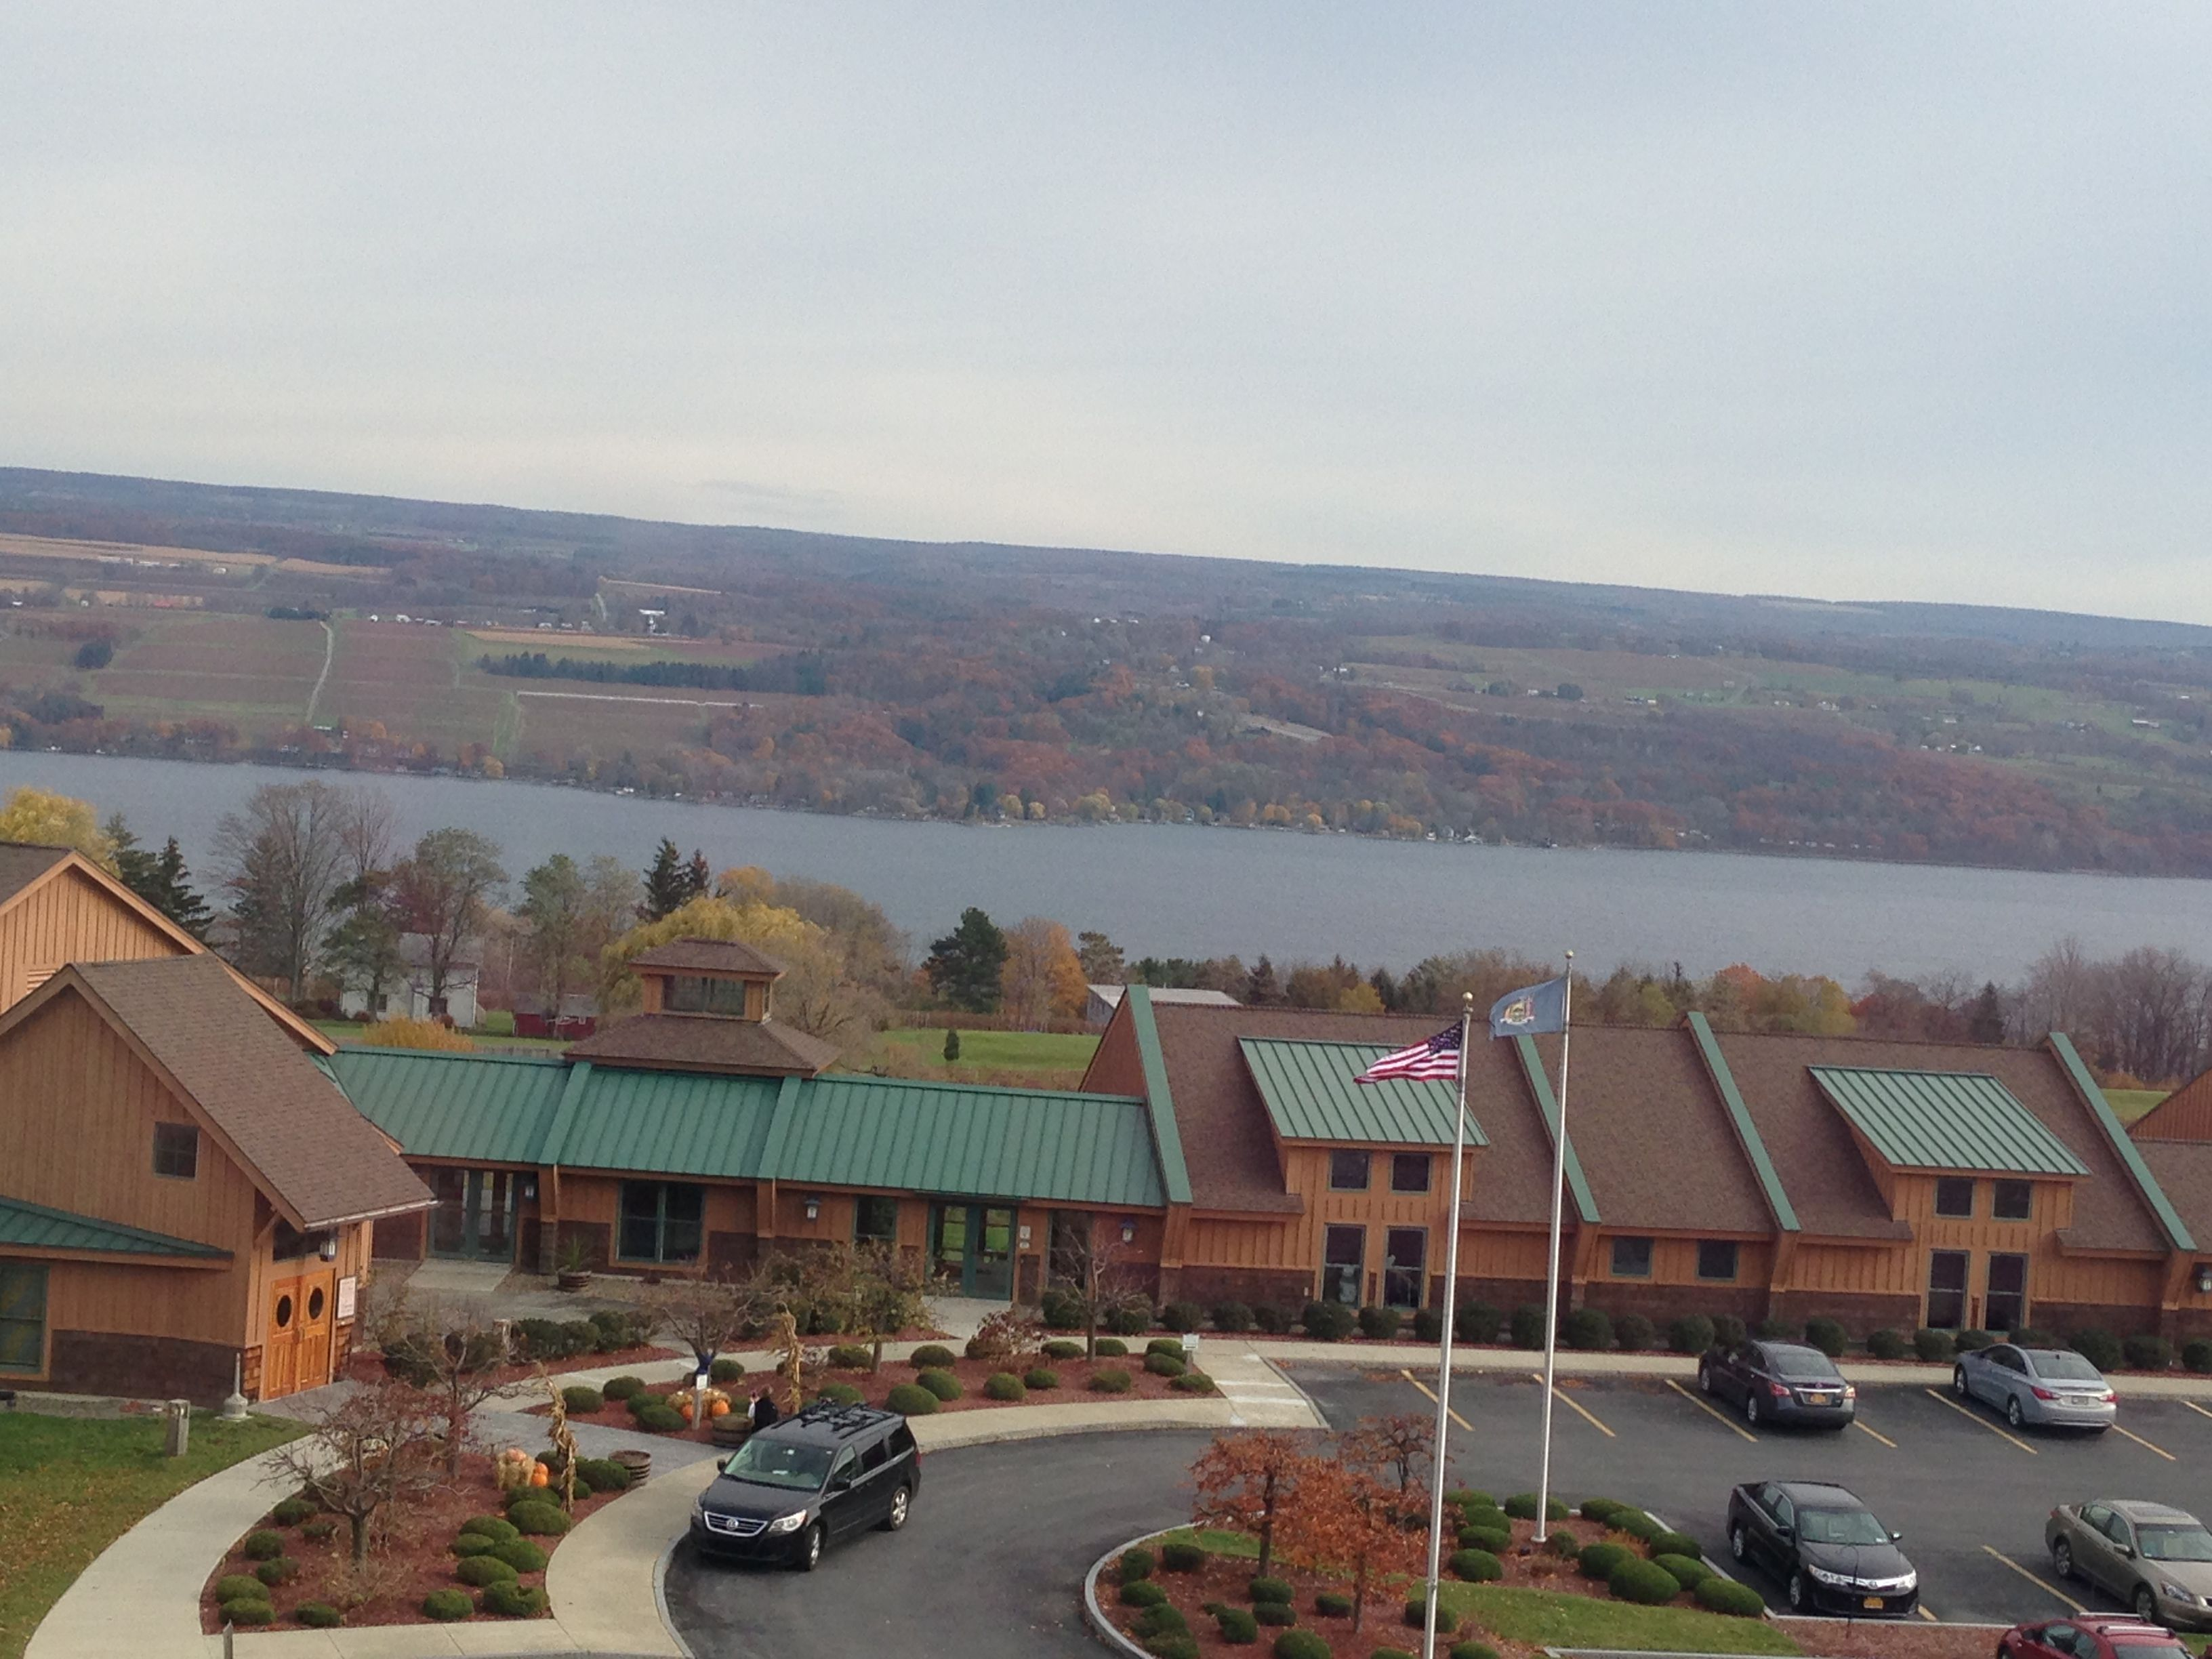 Glenora Winery Amp Hotel Seneca Lake Ny My Daughter Was